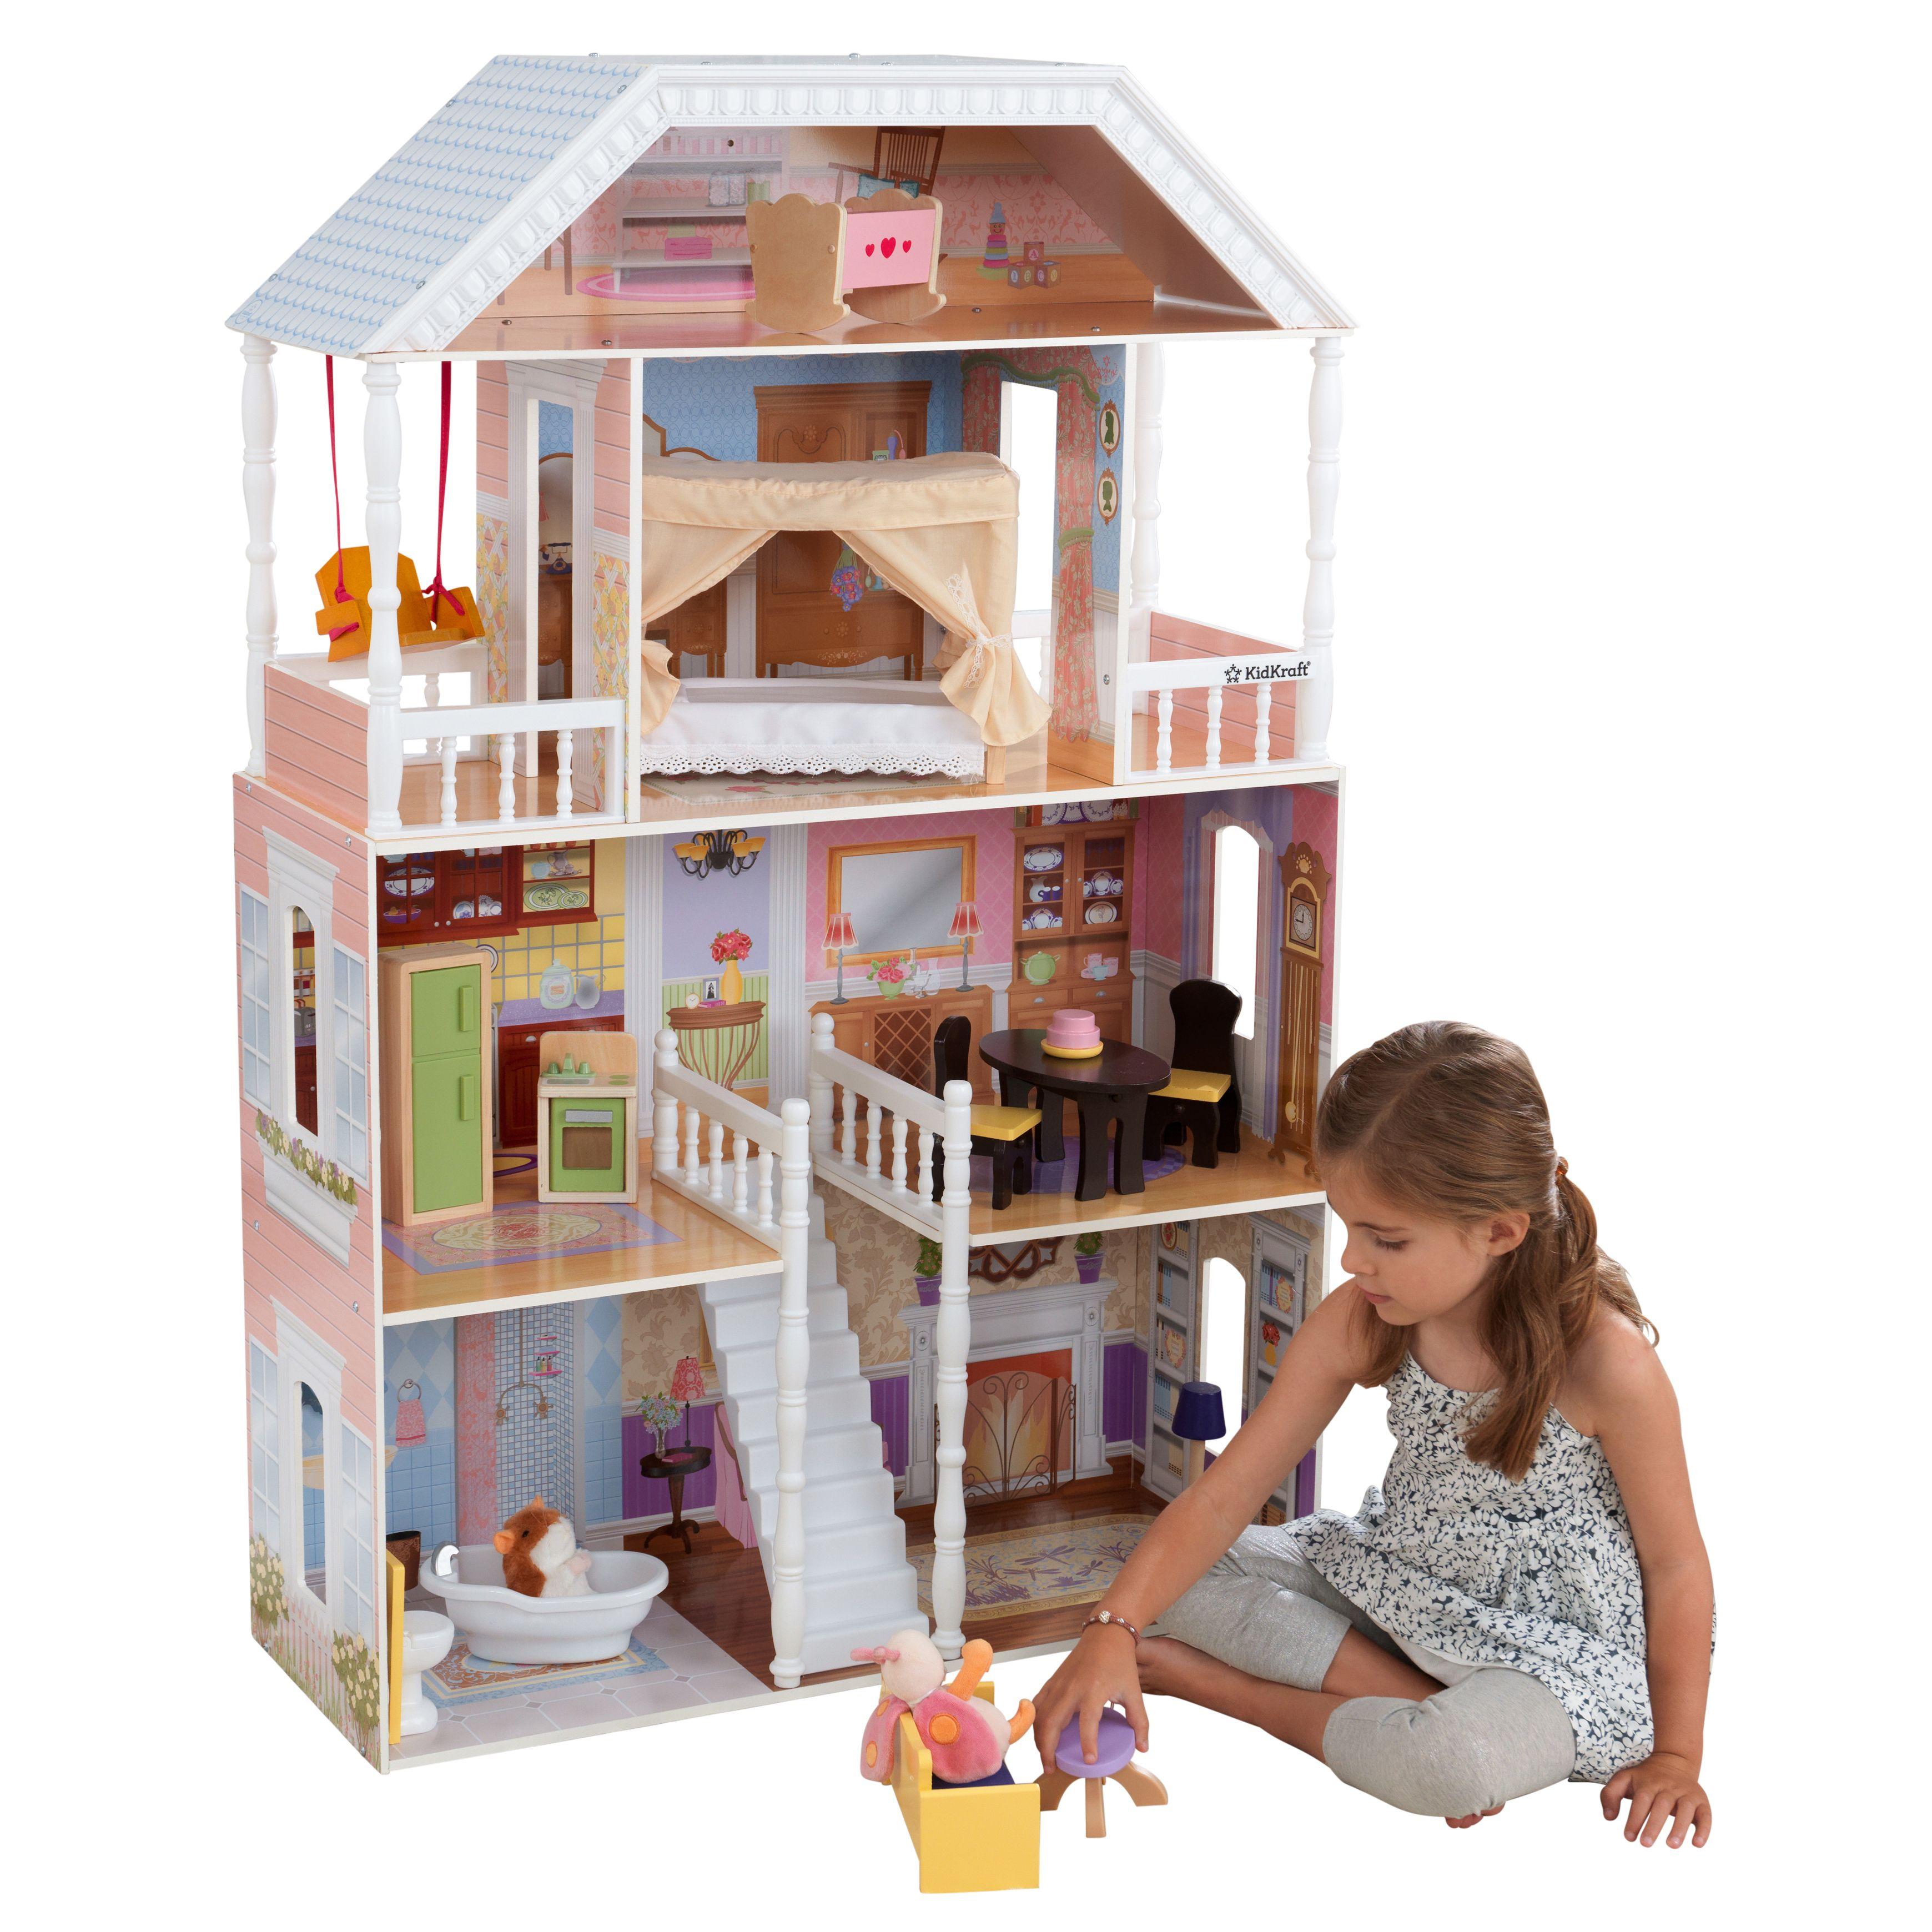 Barbie Dream House Dollhouse Furniture